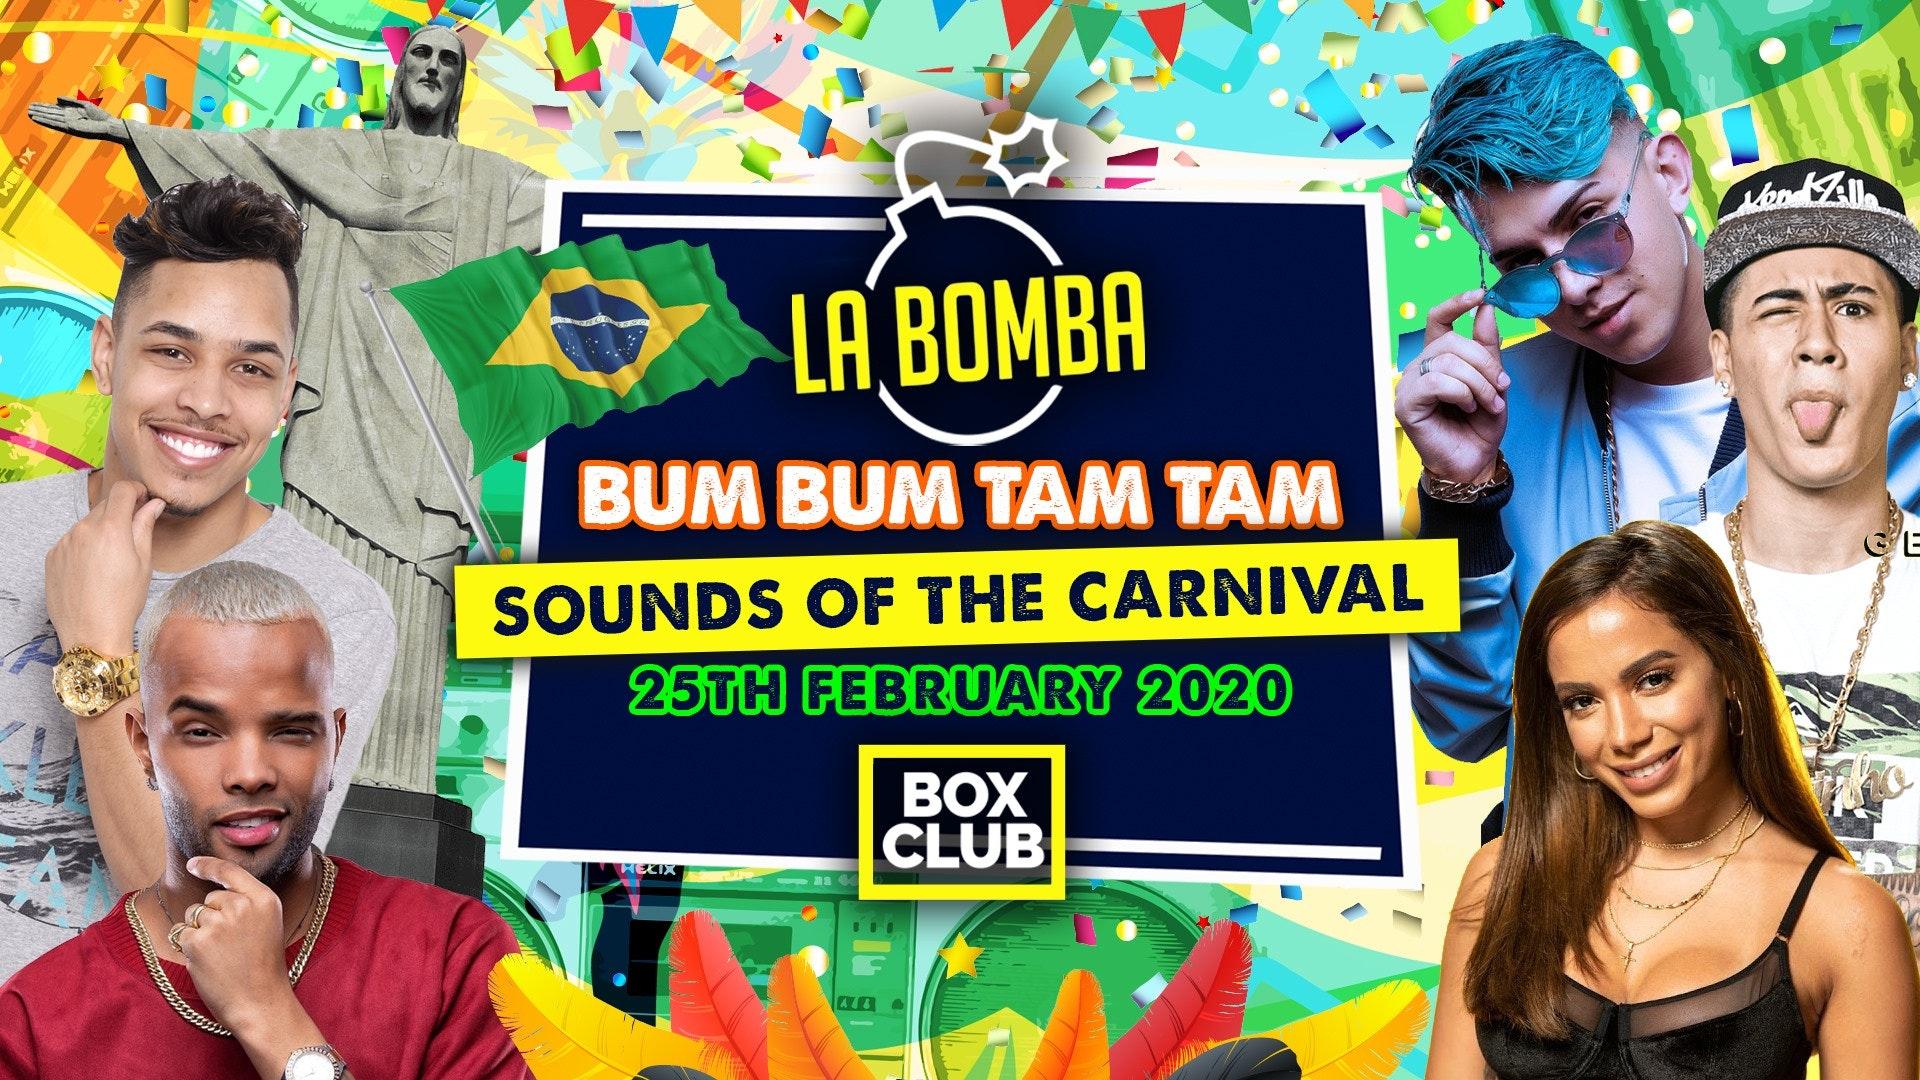 La Bomba / Bum Bum Tam Tam / Sound Of The Carnival – LAST 20 TICKETS